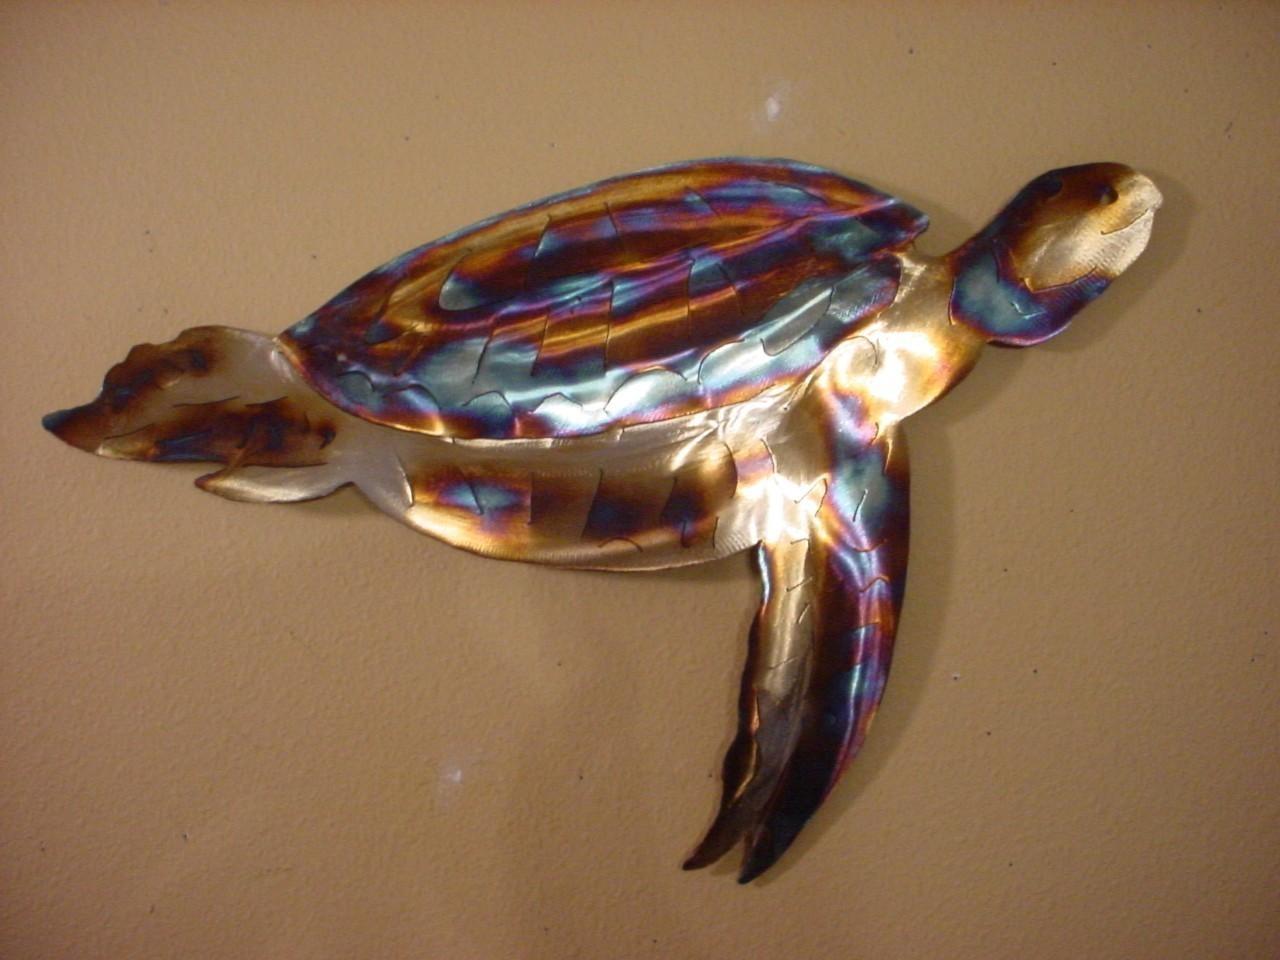 Sea Turtle Hawksbill Green Loggerhead Turtles Steel Ocean Regarding Sea Turtle Metal Wall Art (View 4 of 20)